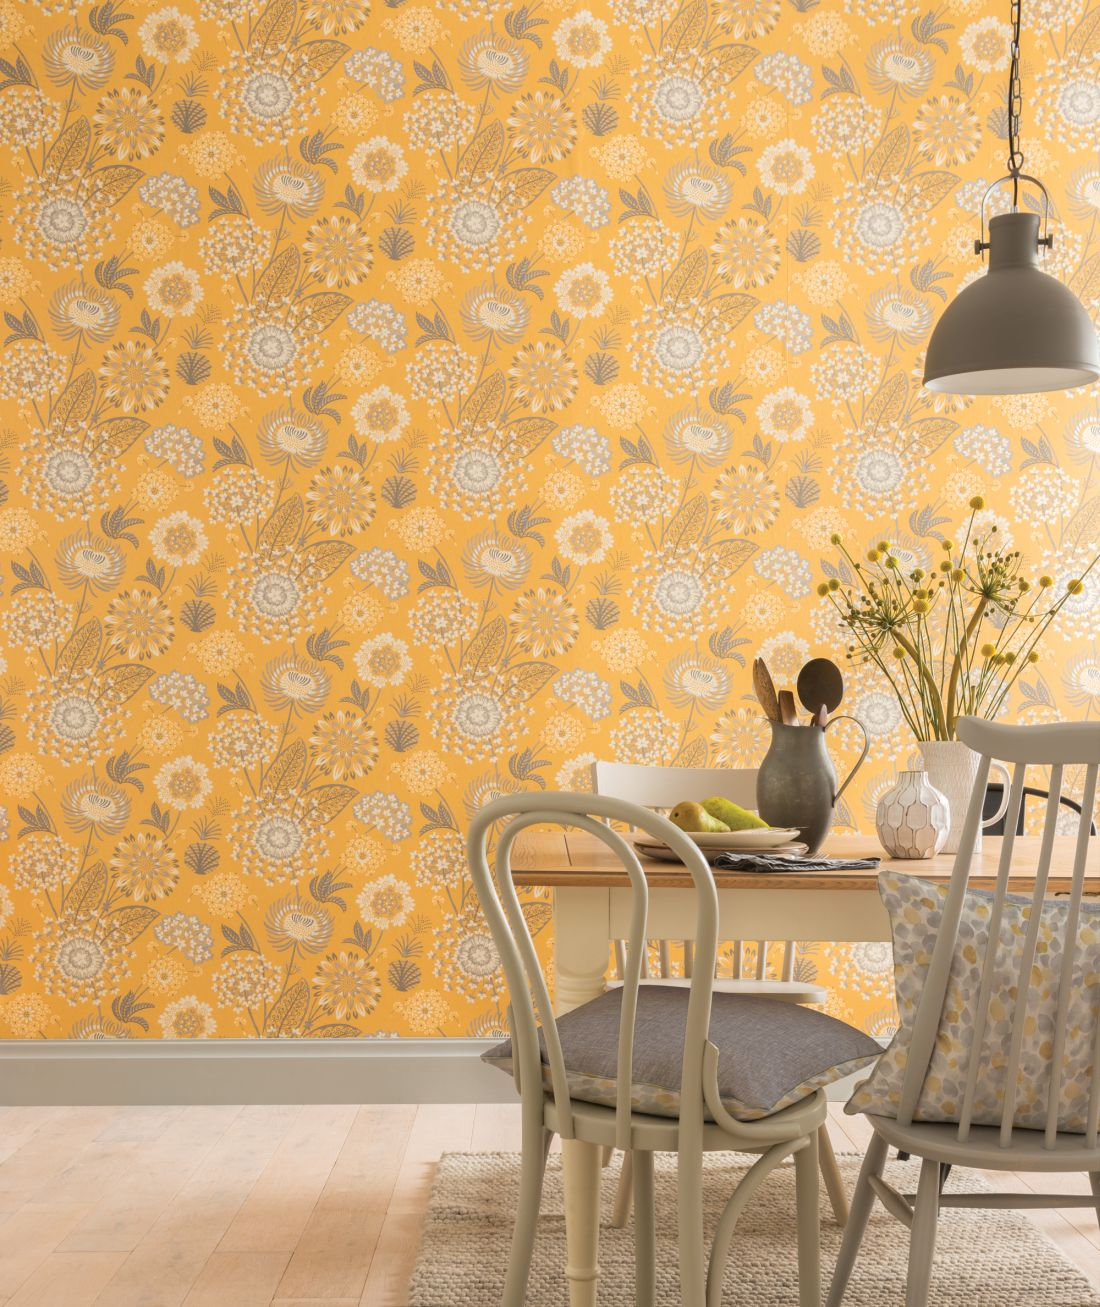 5arthouse_vintage-bloom-mustard-yellow-wallpaper.jpg